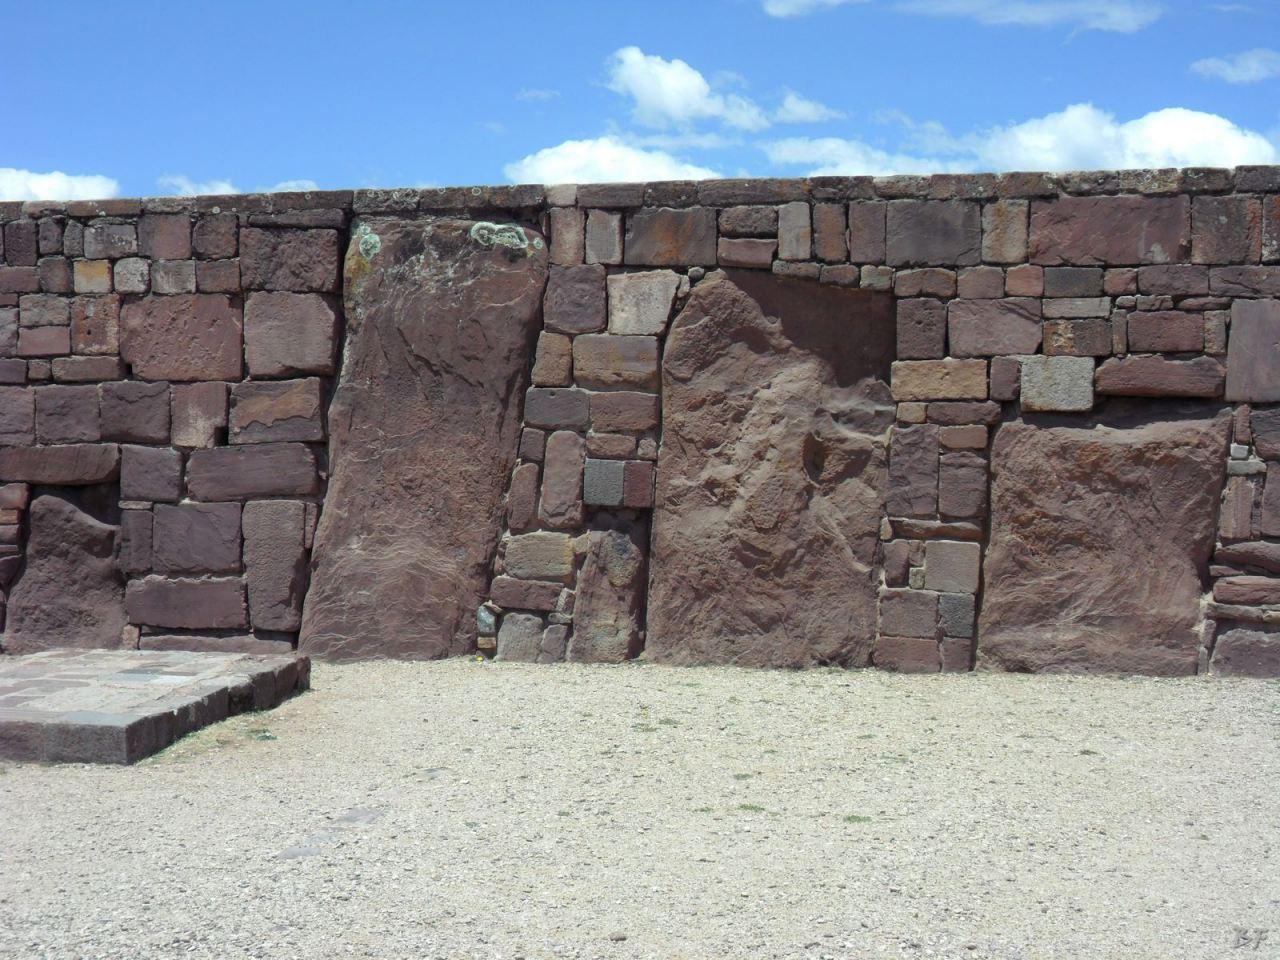 Sito-Megalitico-Piramide-Akapana-Kalasasaya-Menhir-Tiahuanaco-Bolivia-17